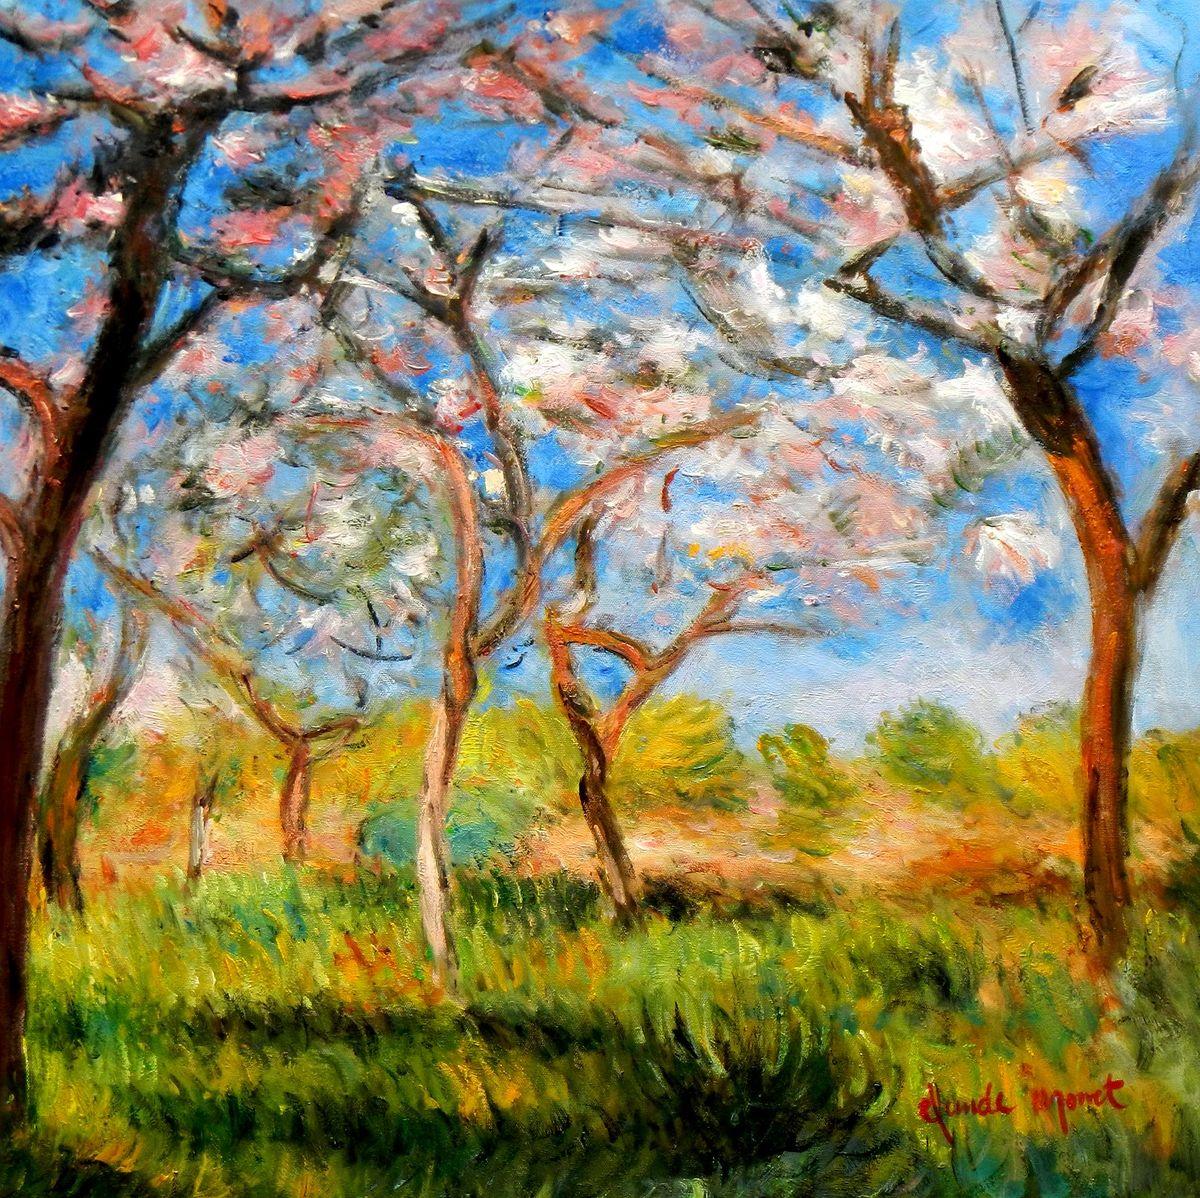 Claude Monet - Frühling in Giverny e96704 60x60cm exzellentes Ölgemälde